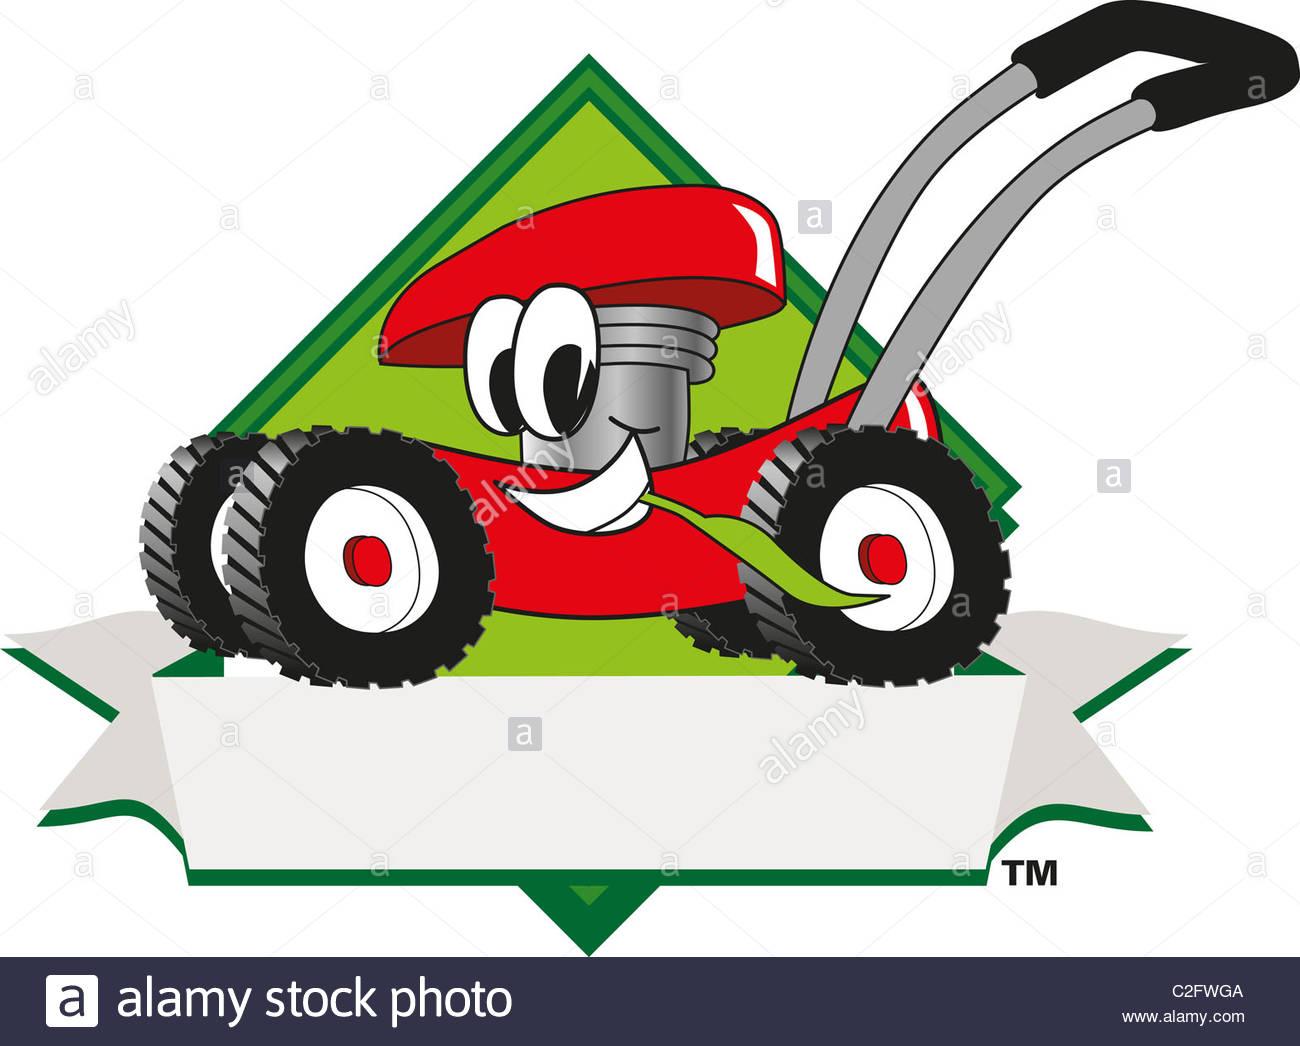 1300x1046 Cartoon Lawn Mower Clip Art And Logo Template Stock Photo